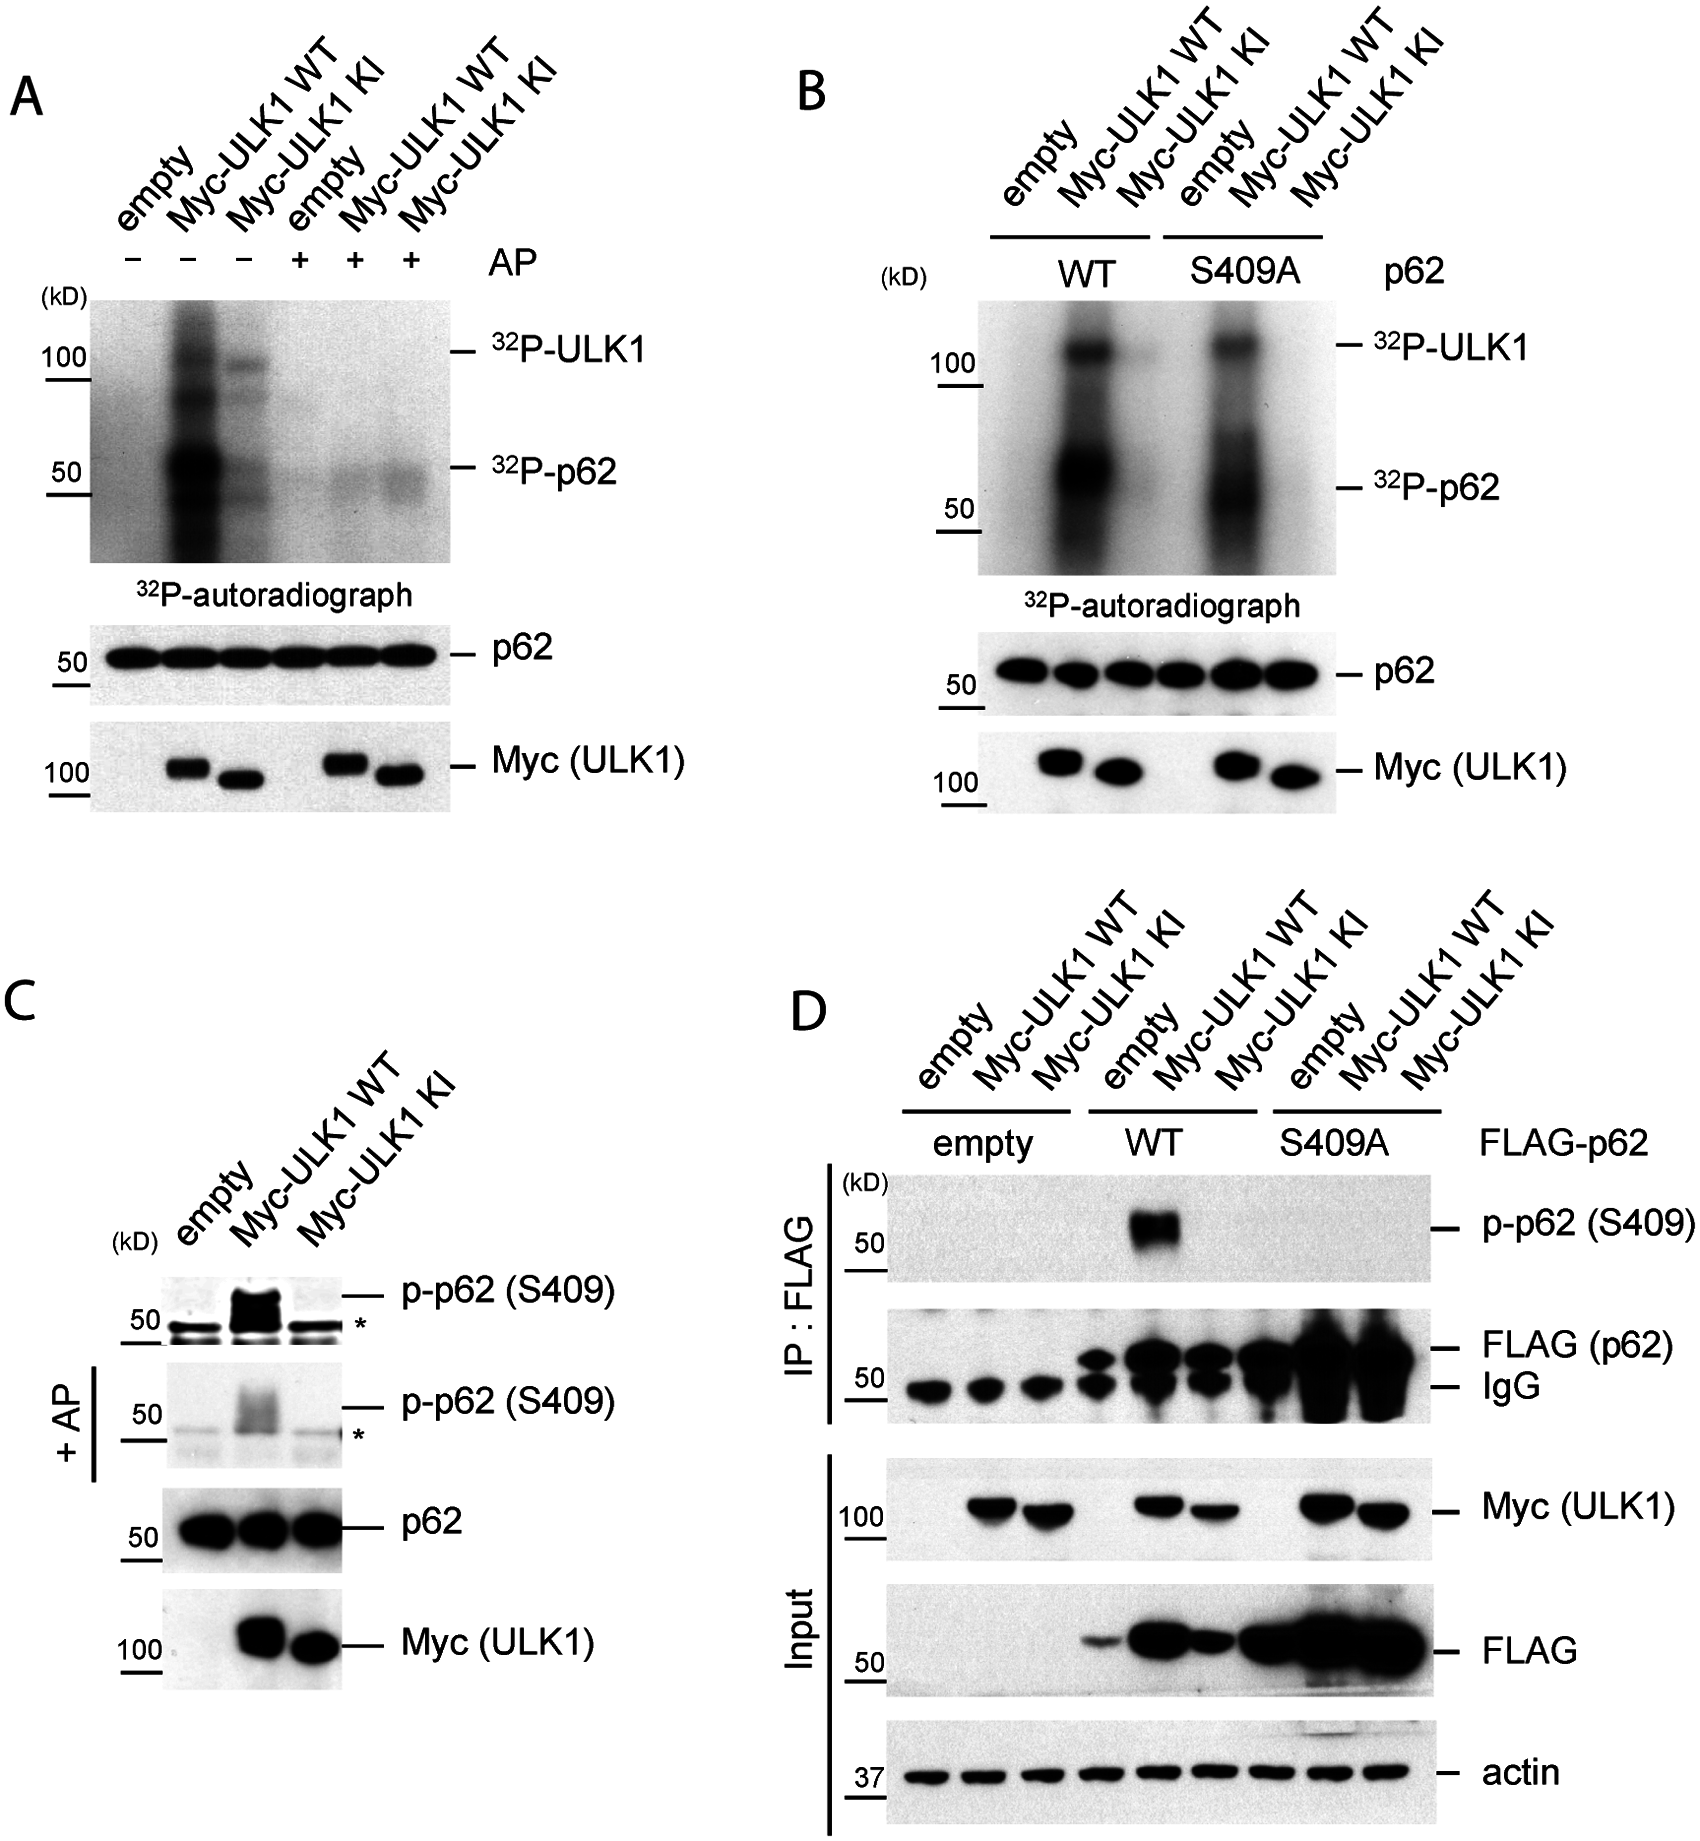 ULK1 phosphorylates p62 at S409.